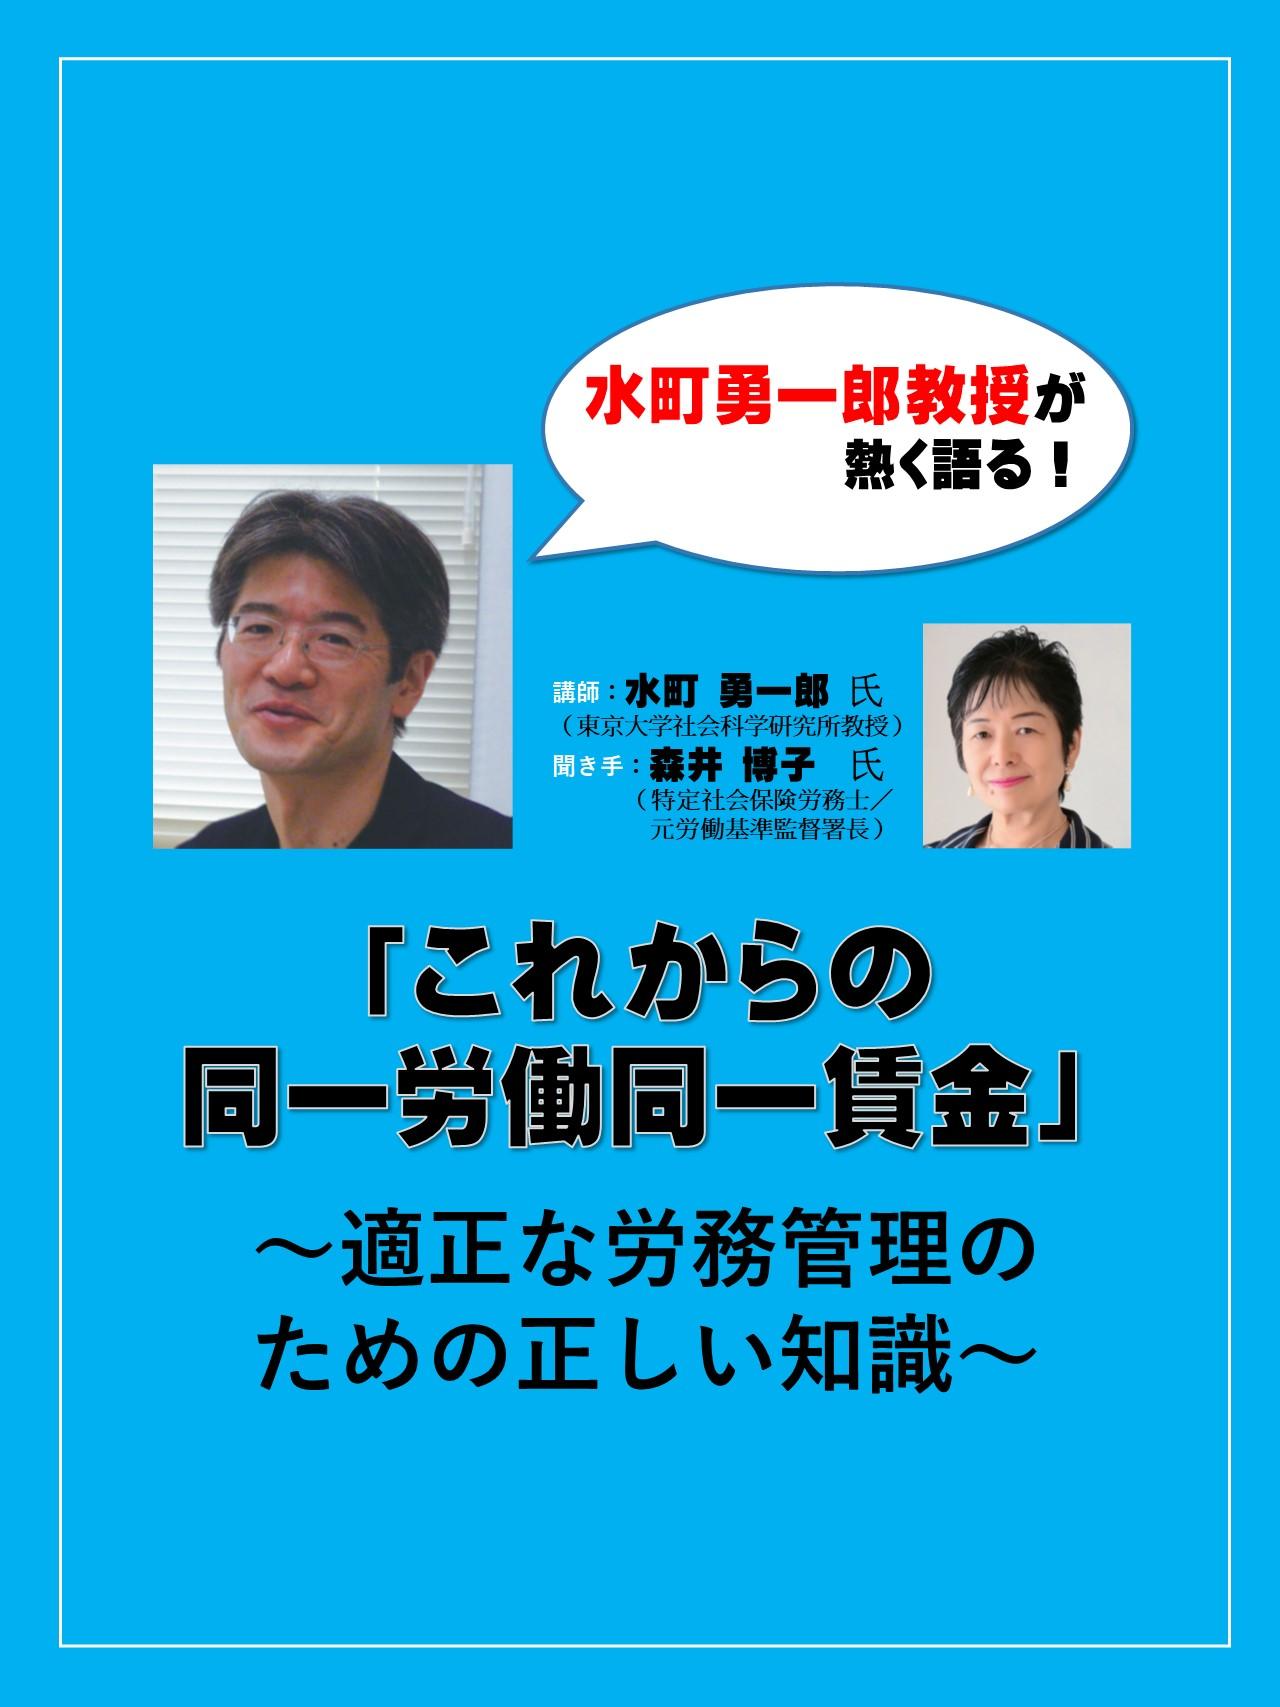 ※SJS会員限定無料WEBセミナー※【2/12】水町勇一郎教授が熱く語る!「これからの同一労働同一賃金」~適正な労務管理のための正しい知識~ 画像